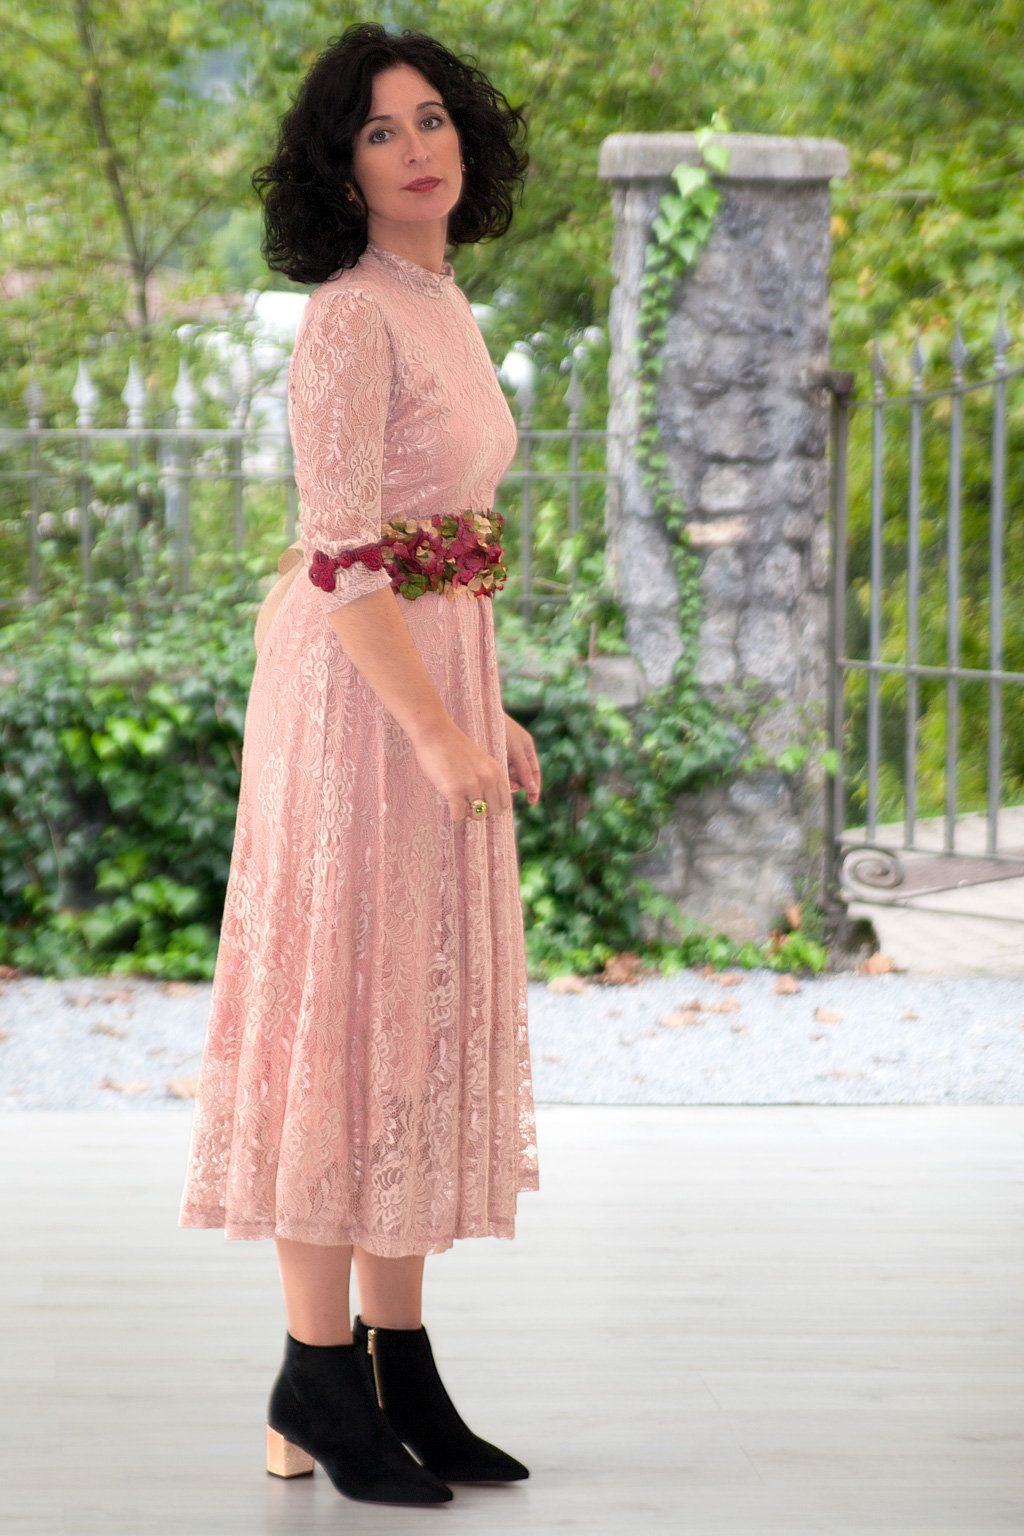 Virginia Rekalde posando para Muselines con vestido de Vuelve Marcela, cinturón floral de Endanea Garden joyas de Casa Munoa y Botines de Ainhoa Etxeberria - The Shoe Boutique